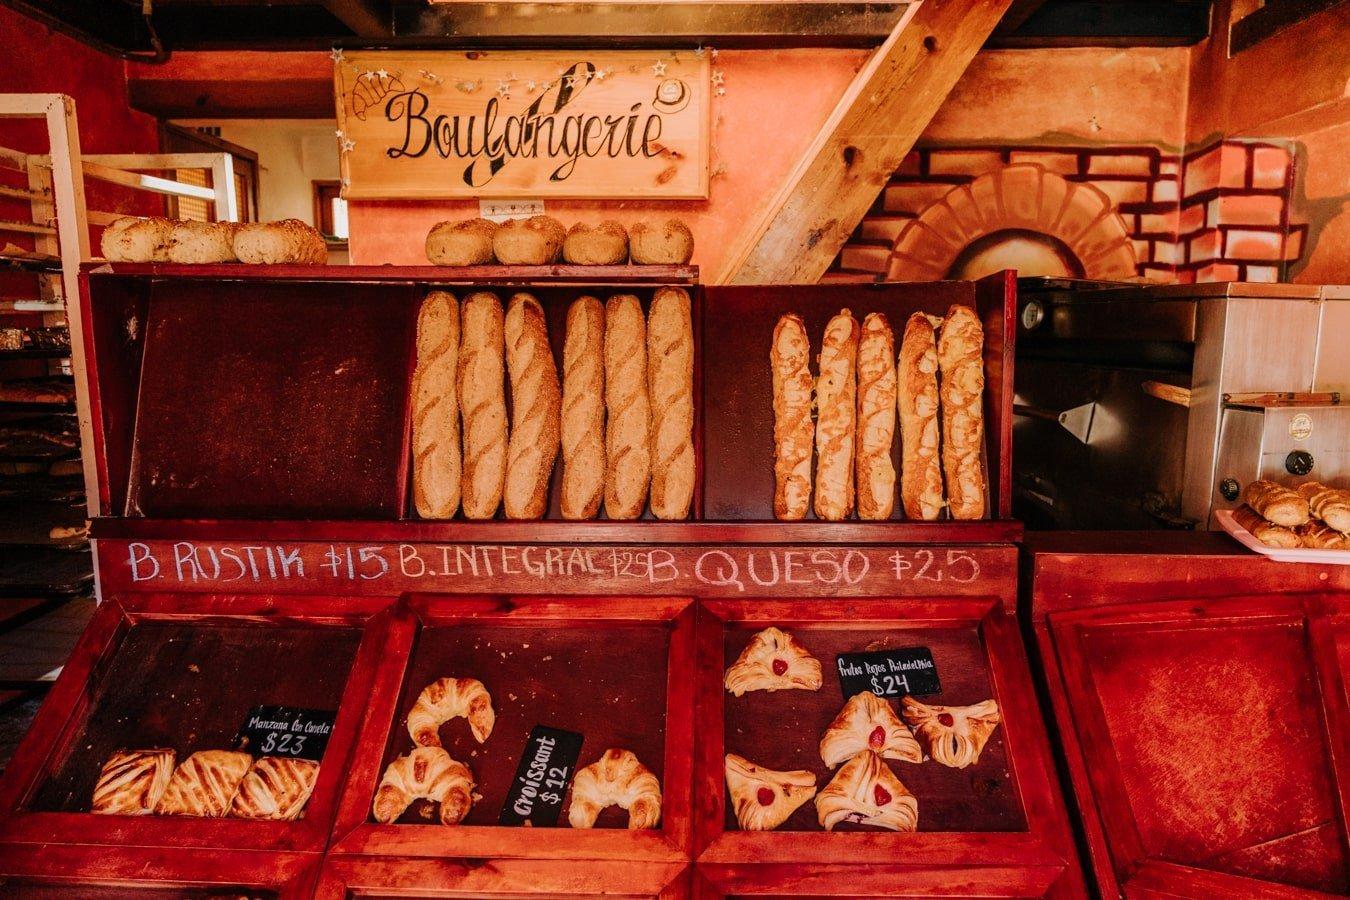 raices san cristobal - french bread Roots panaderia artisanal san cristobal de las casas